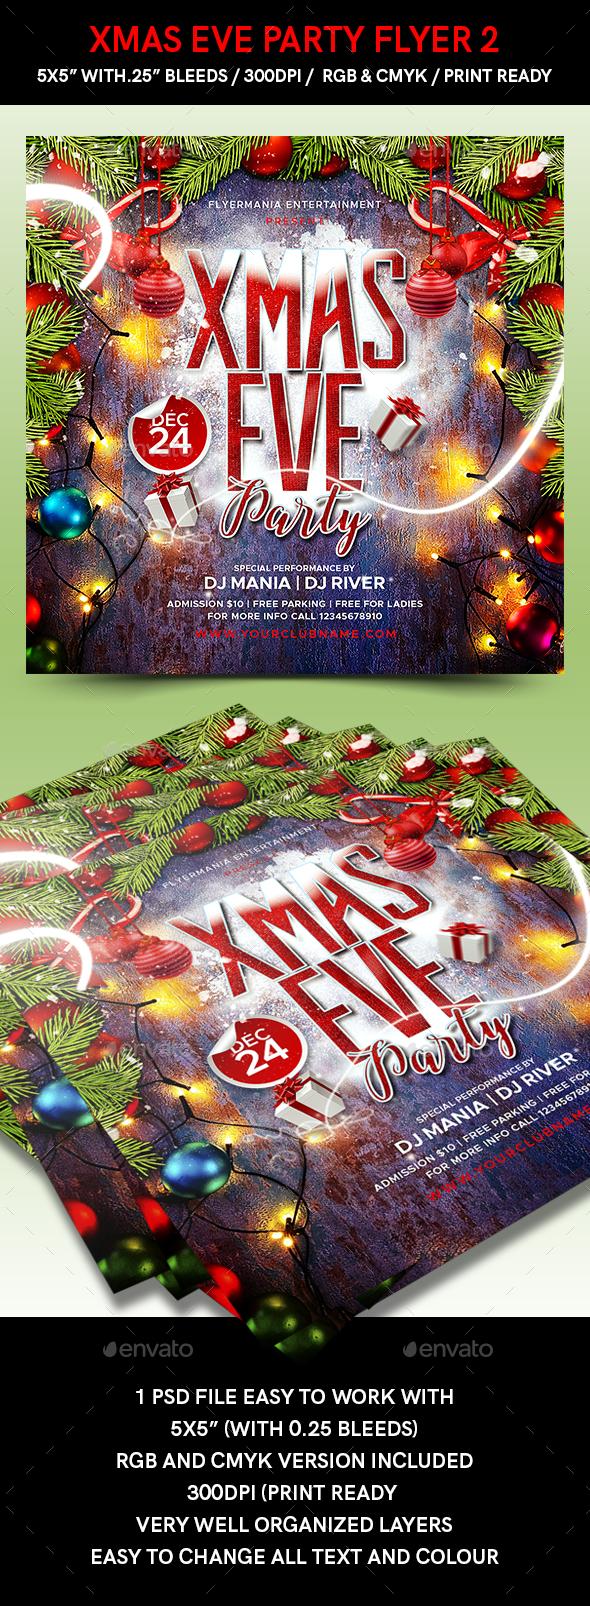 Xmas Eve Party Flyer 2